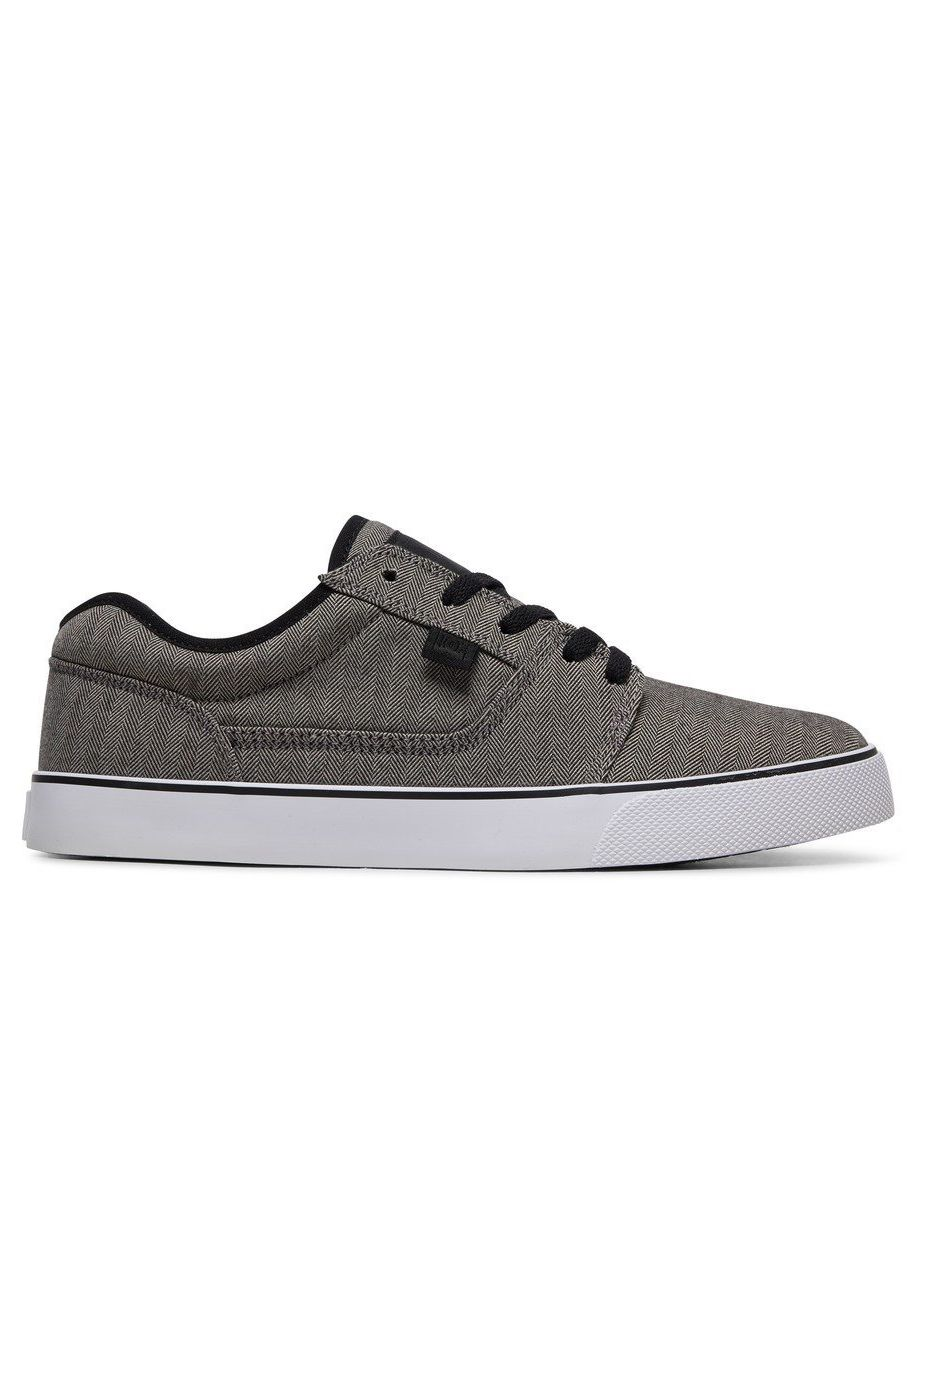 DC Shoes Shoes TONIK TX SE Black/Armor/Black